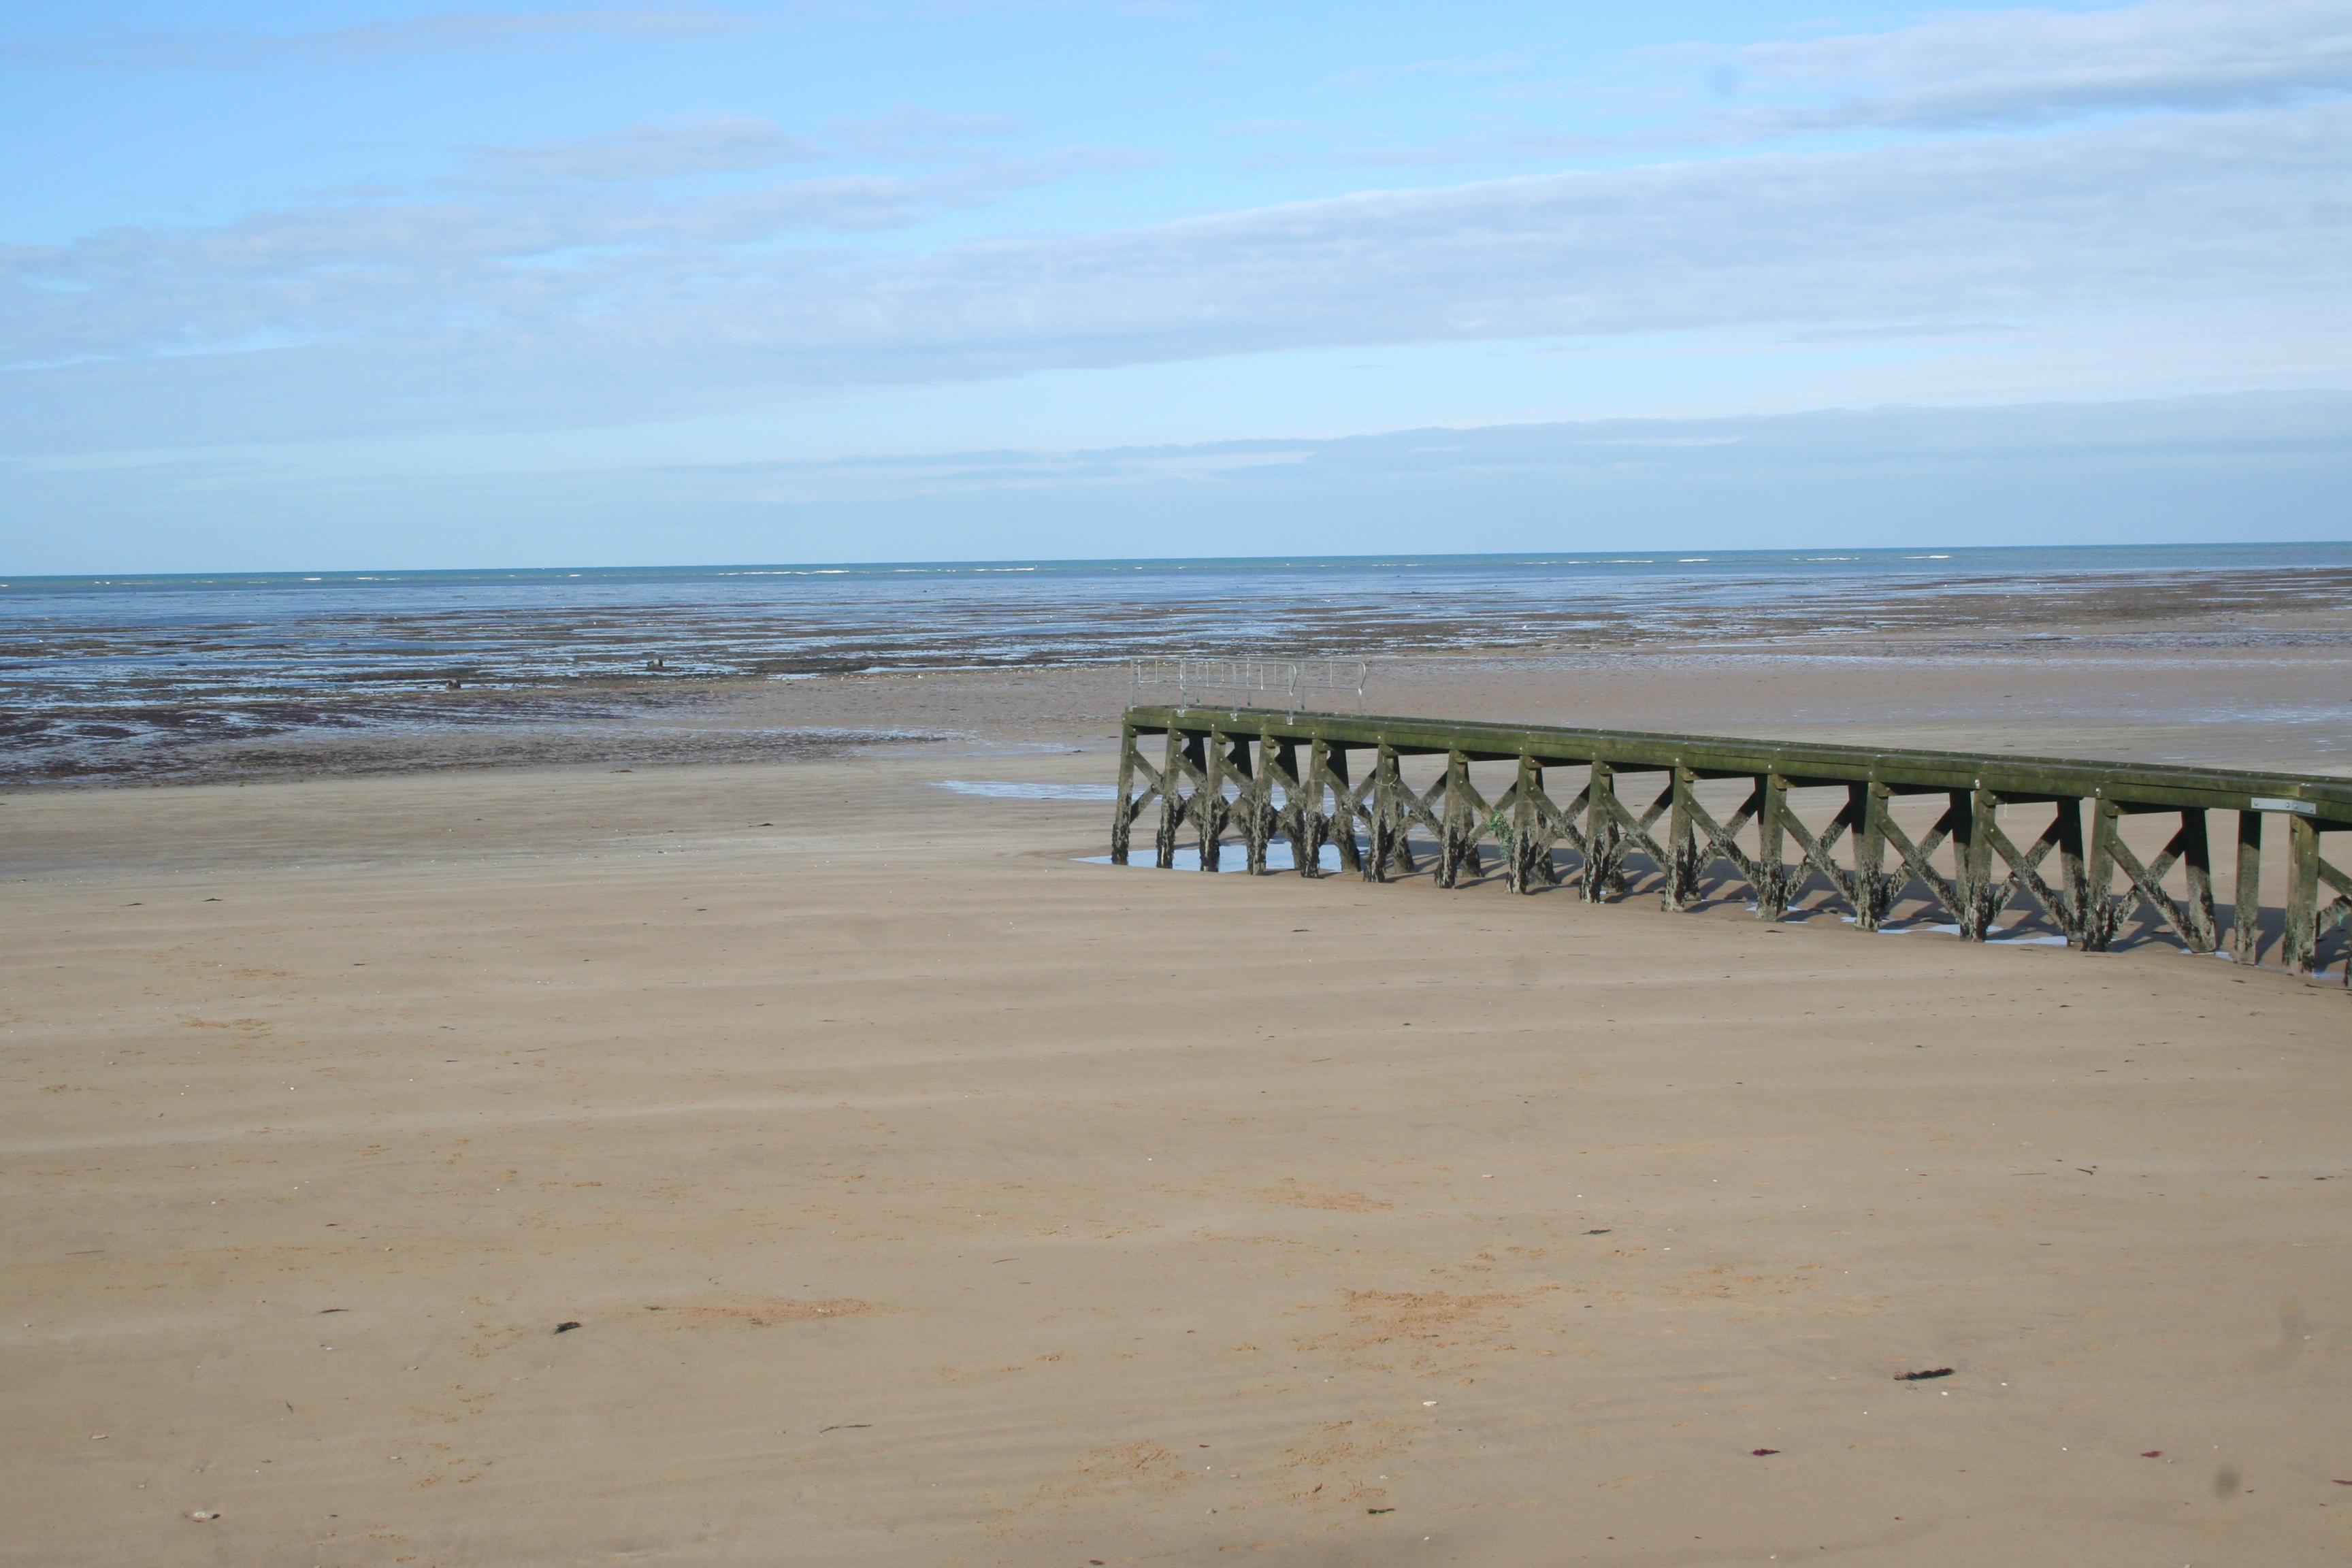 Grandcamp Maisy - la plage et l'épi